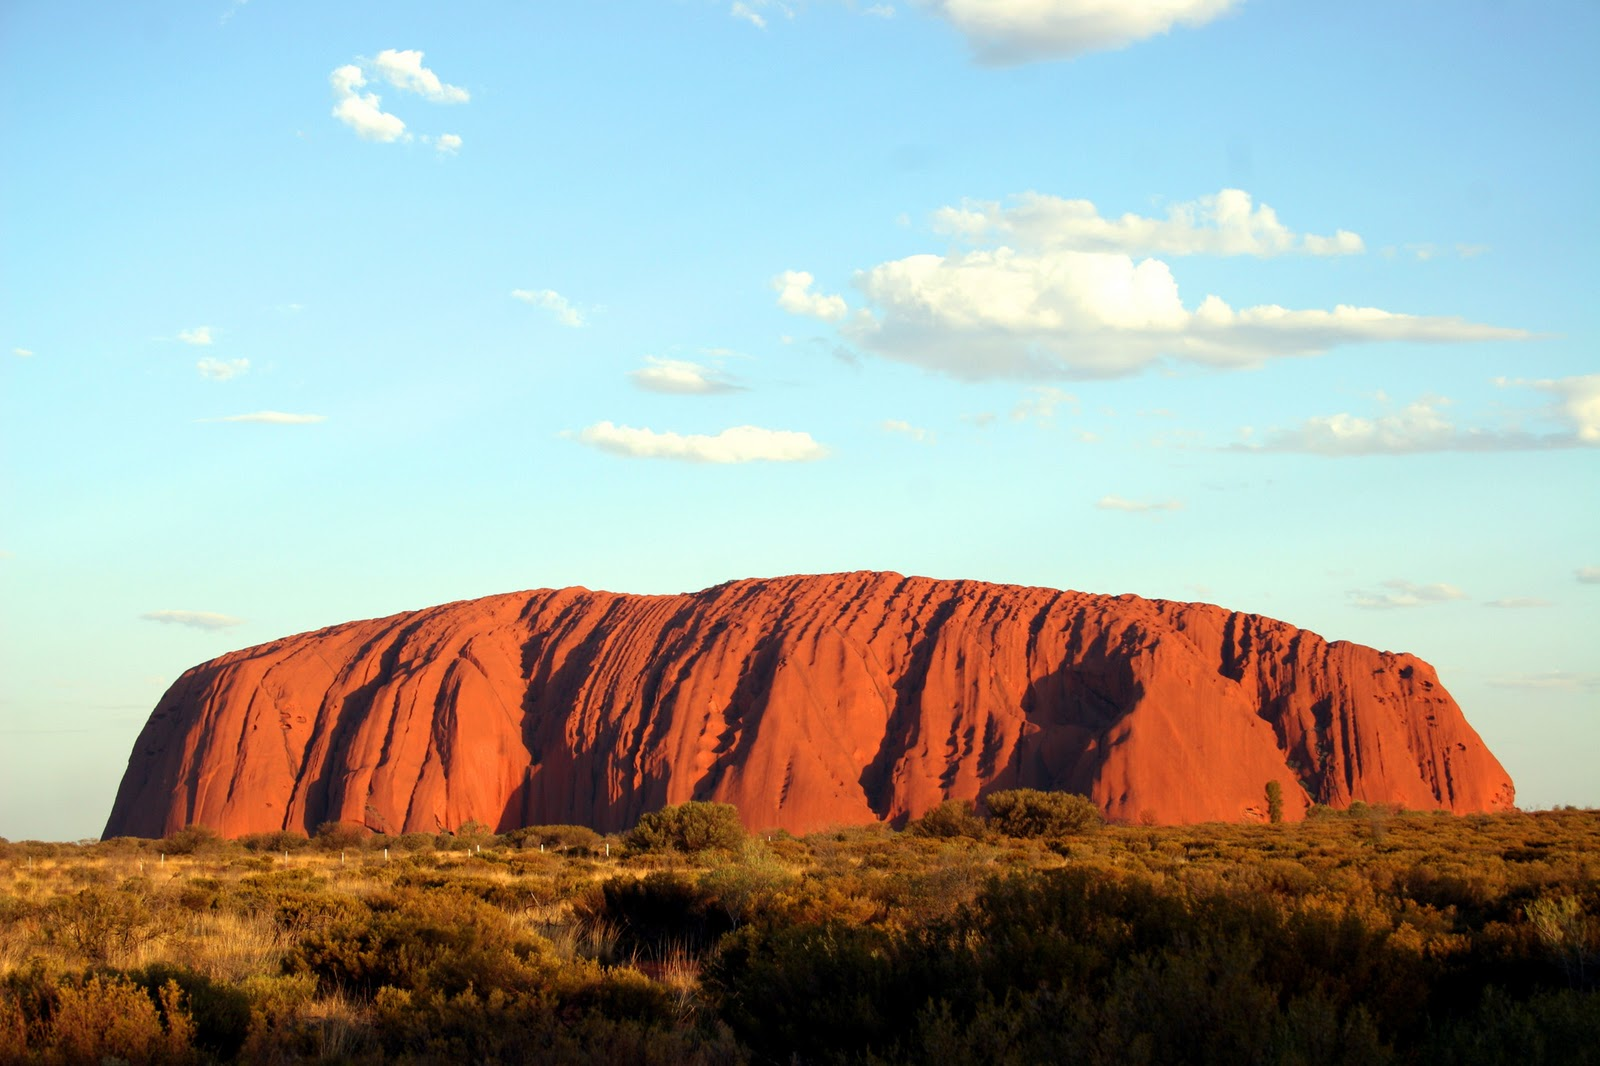 http://3.bp.blogspot.com/-NptrH7d7jyc/Twk64UWLK-I/AAAAAAAACUM/u8qVks5rtBc/s1600/Uluru_Ayers_Rock_Alice_Springs_Australia101.jpg